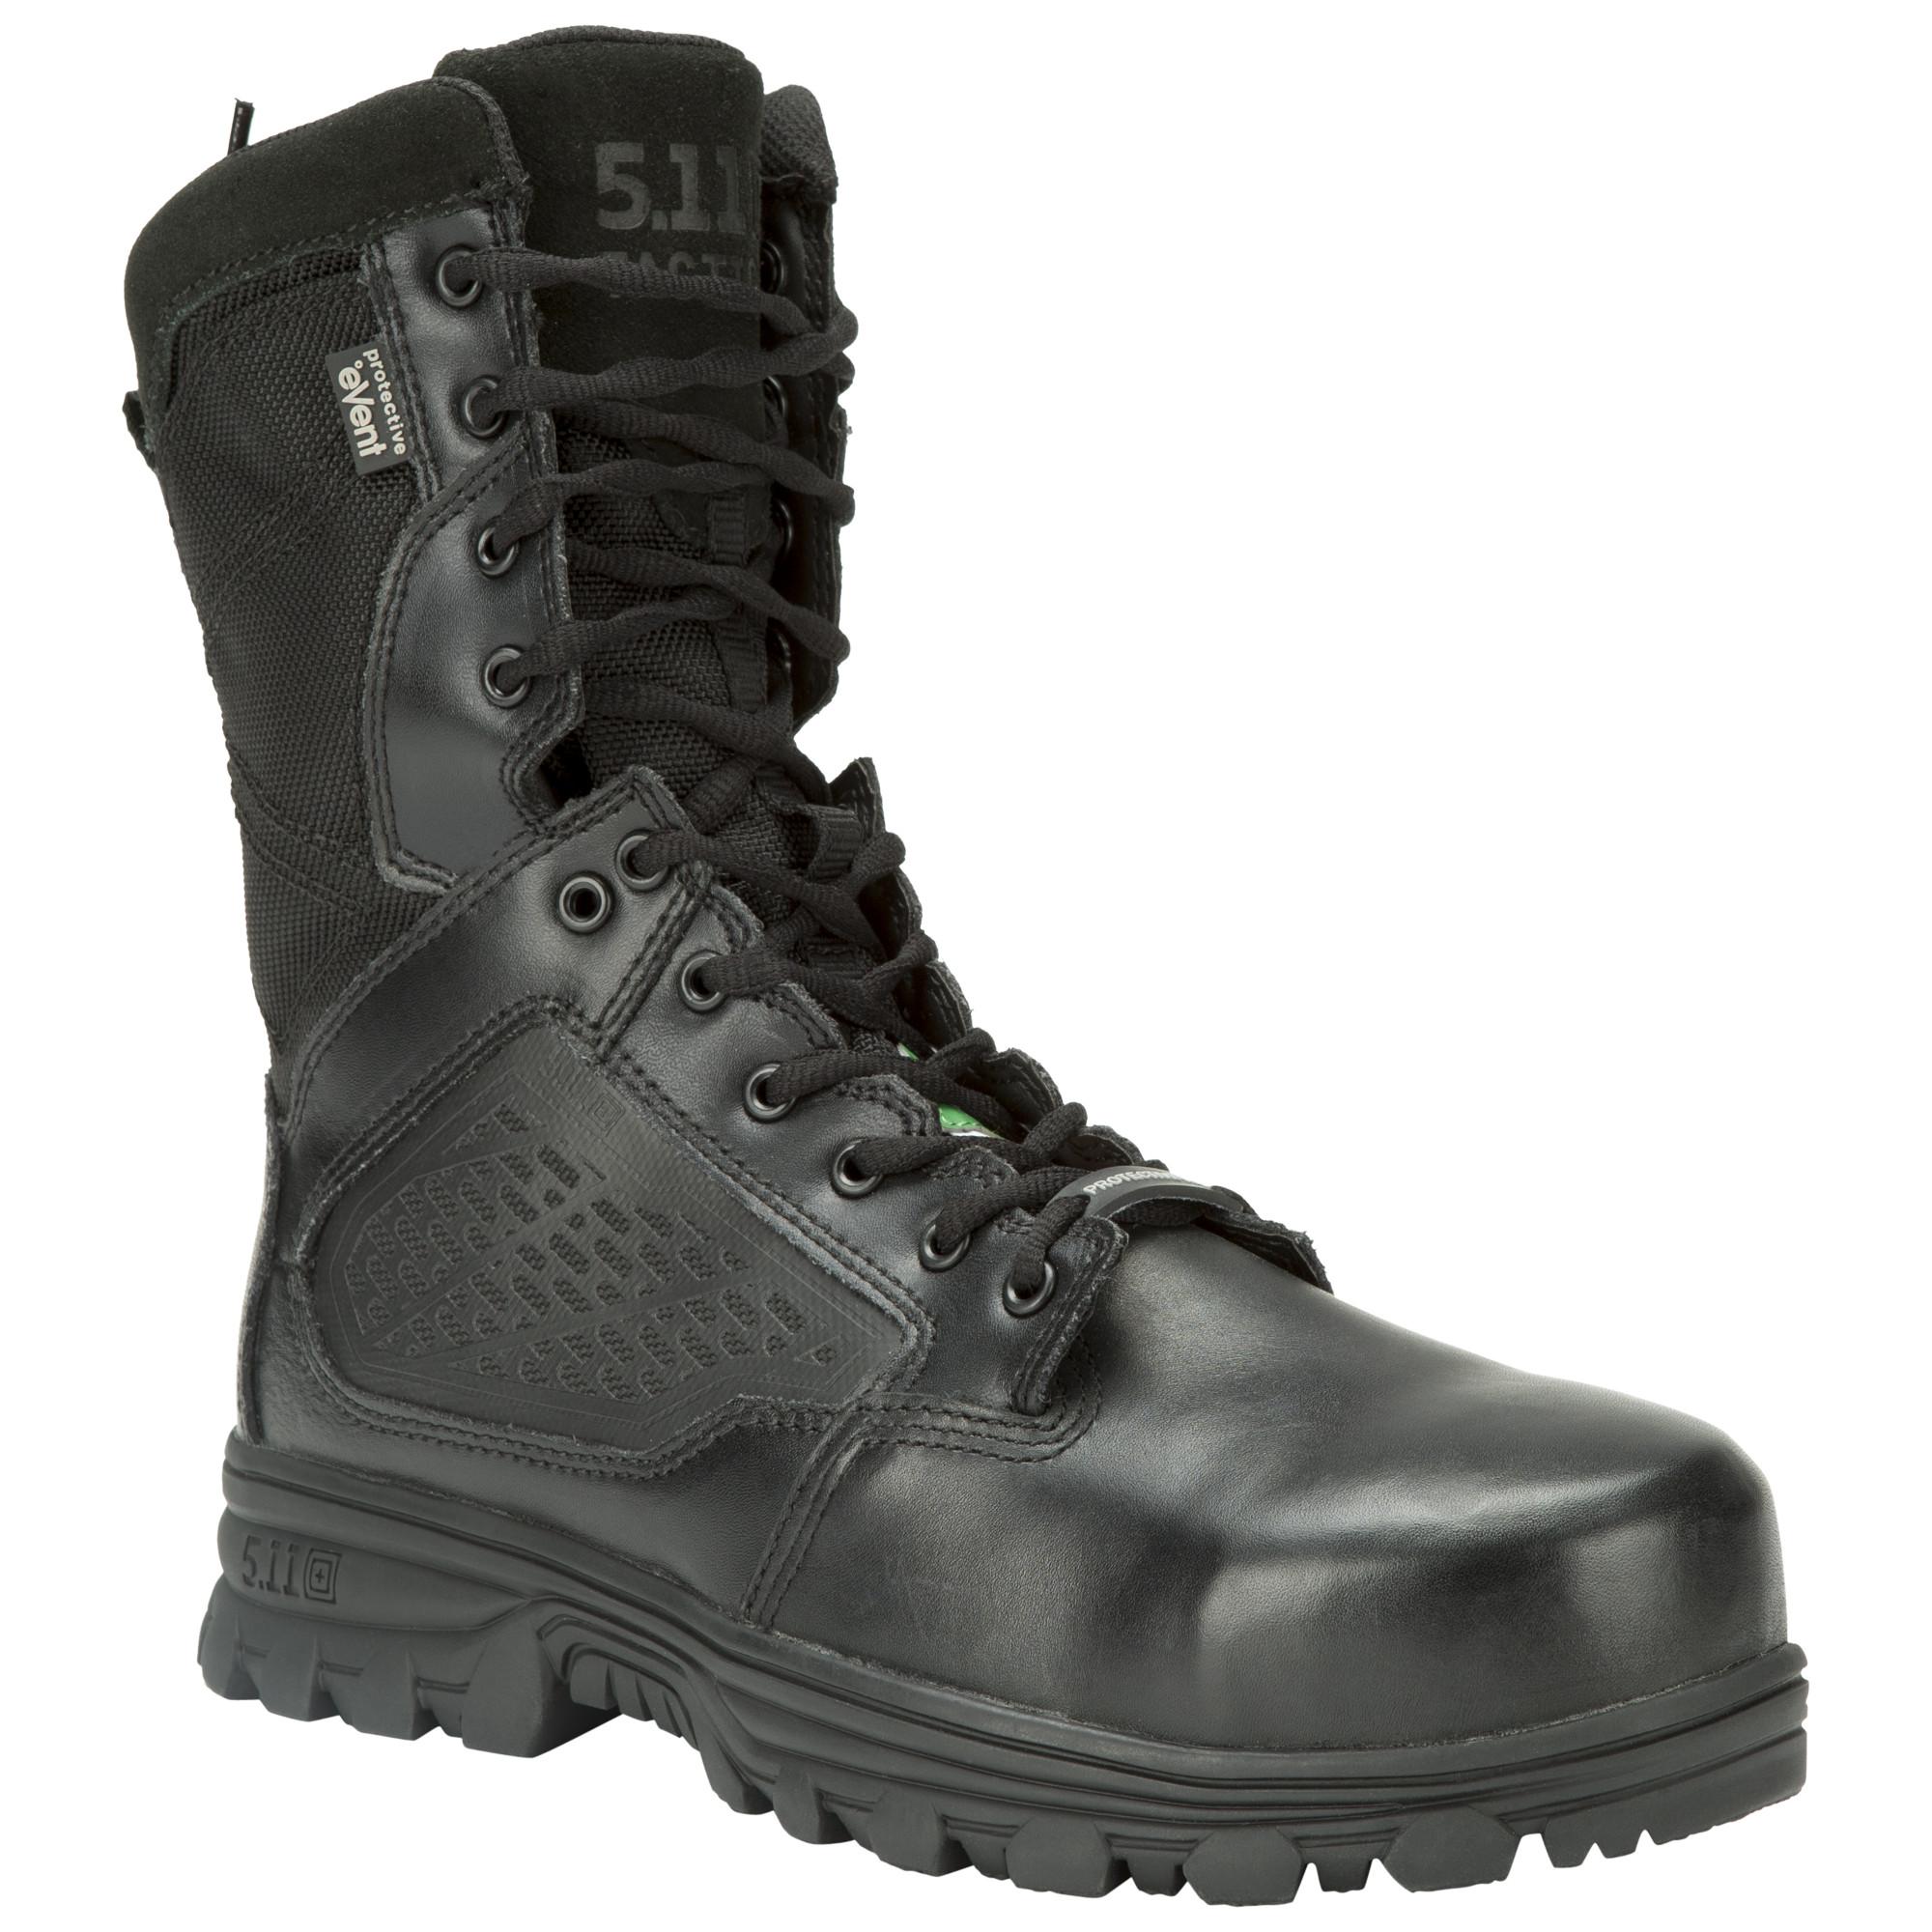 665b2155582 Buy 5.11 Tactical MenS Evo 8